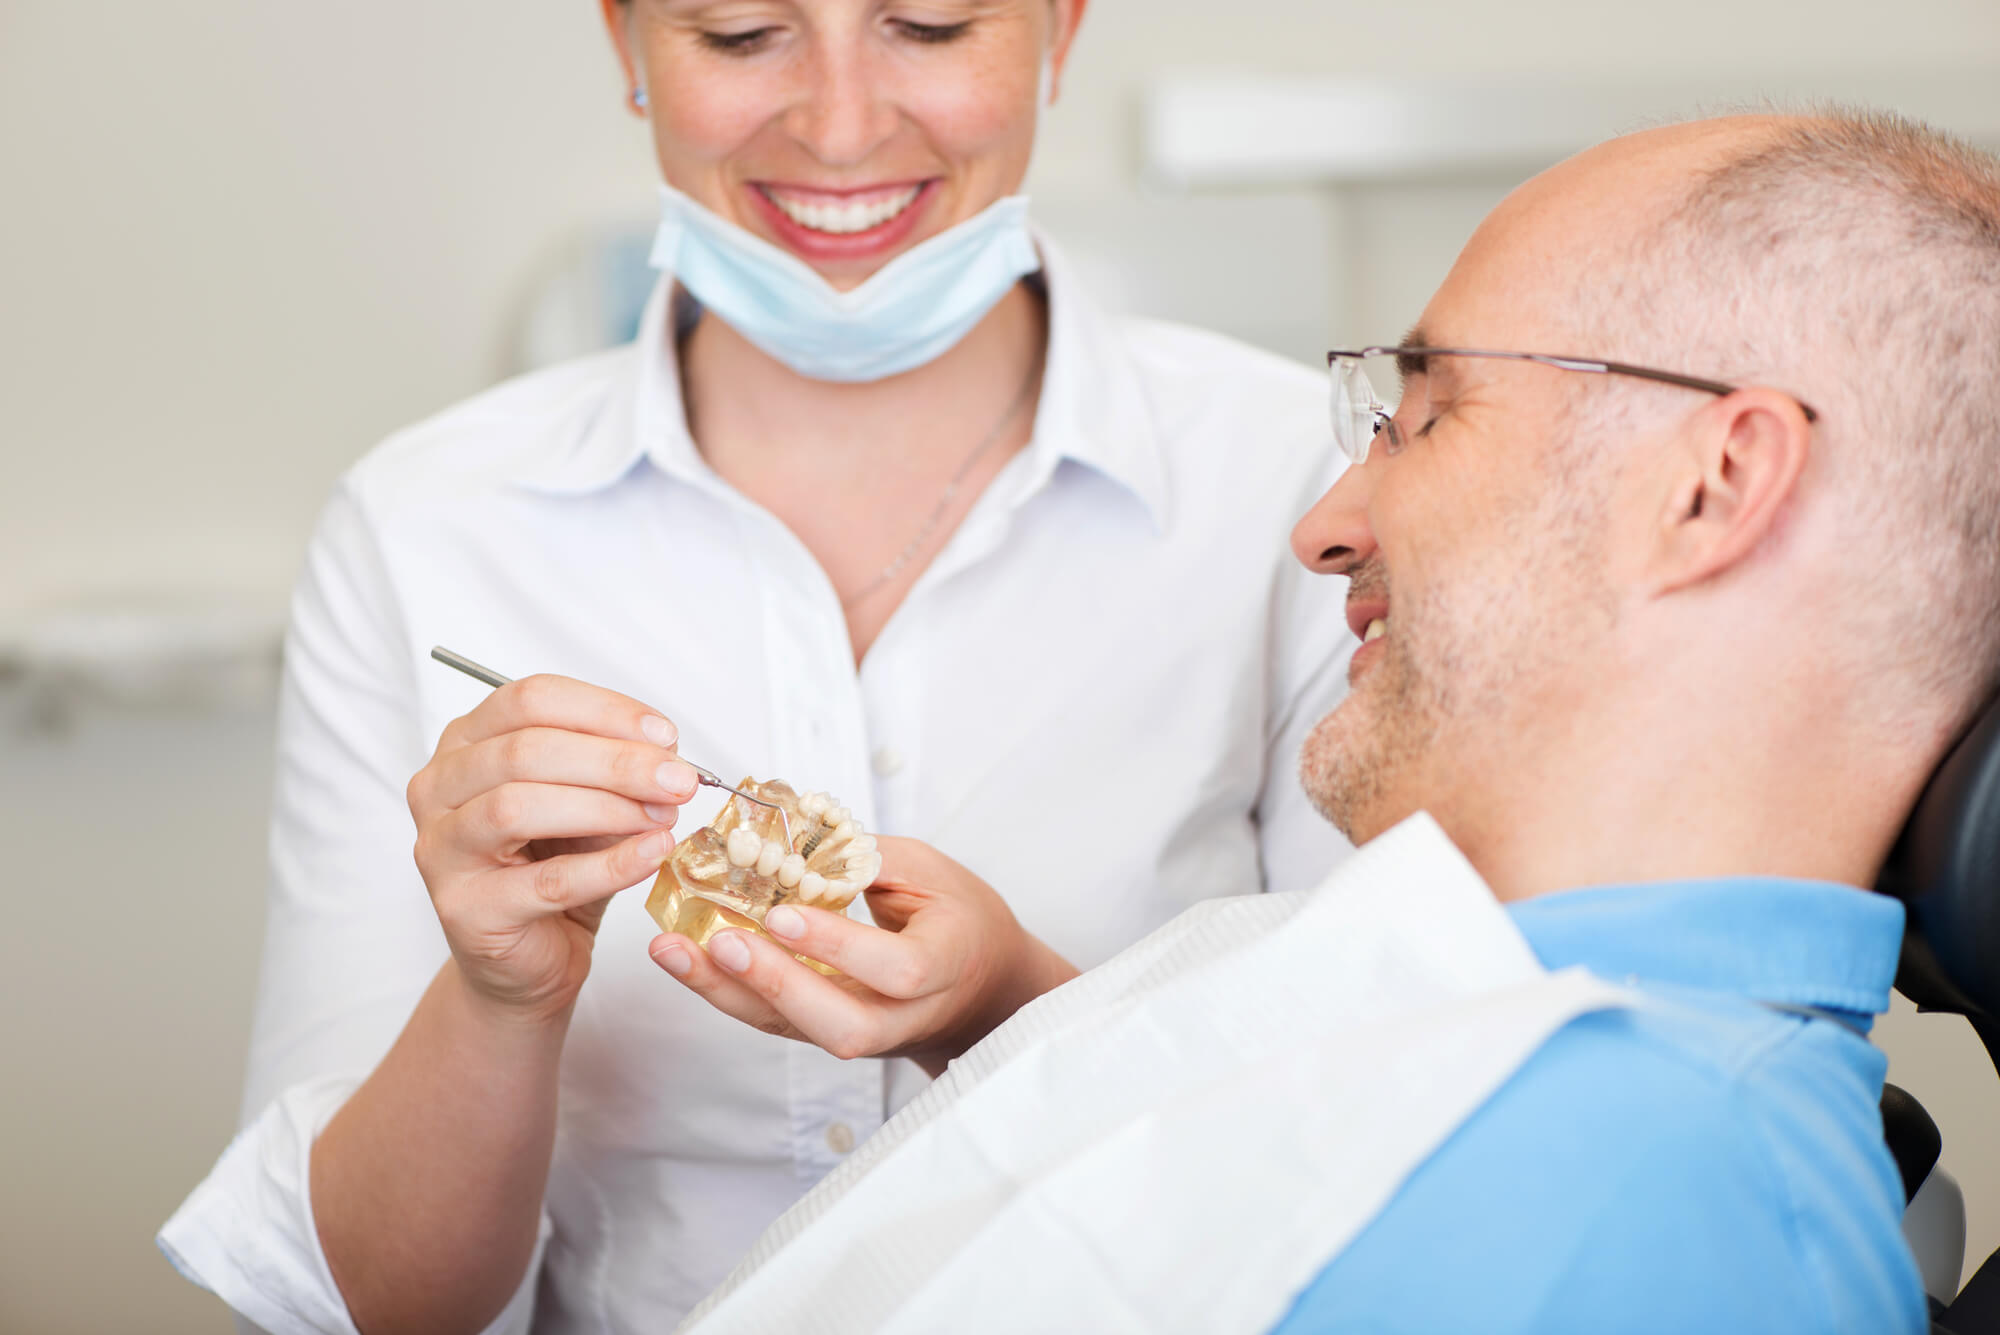 where is the best periodontics miami?